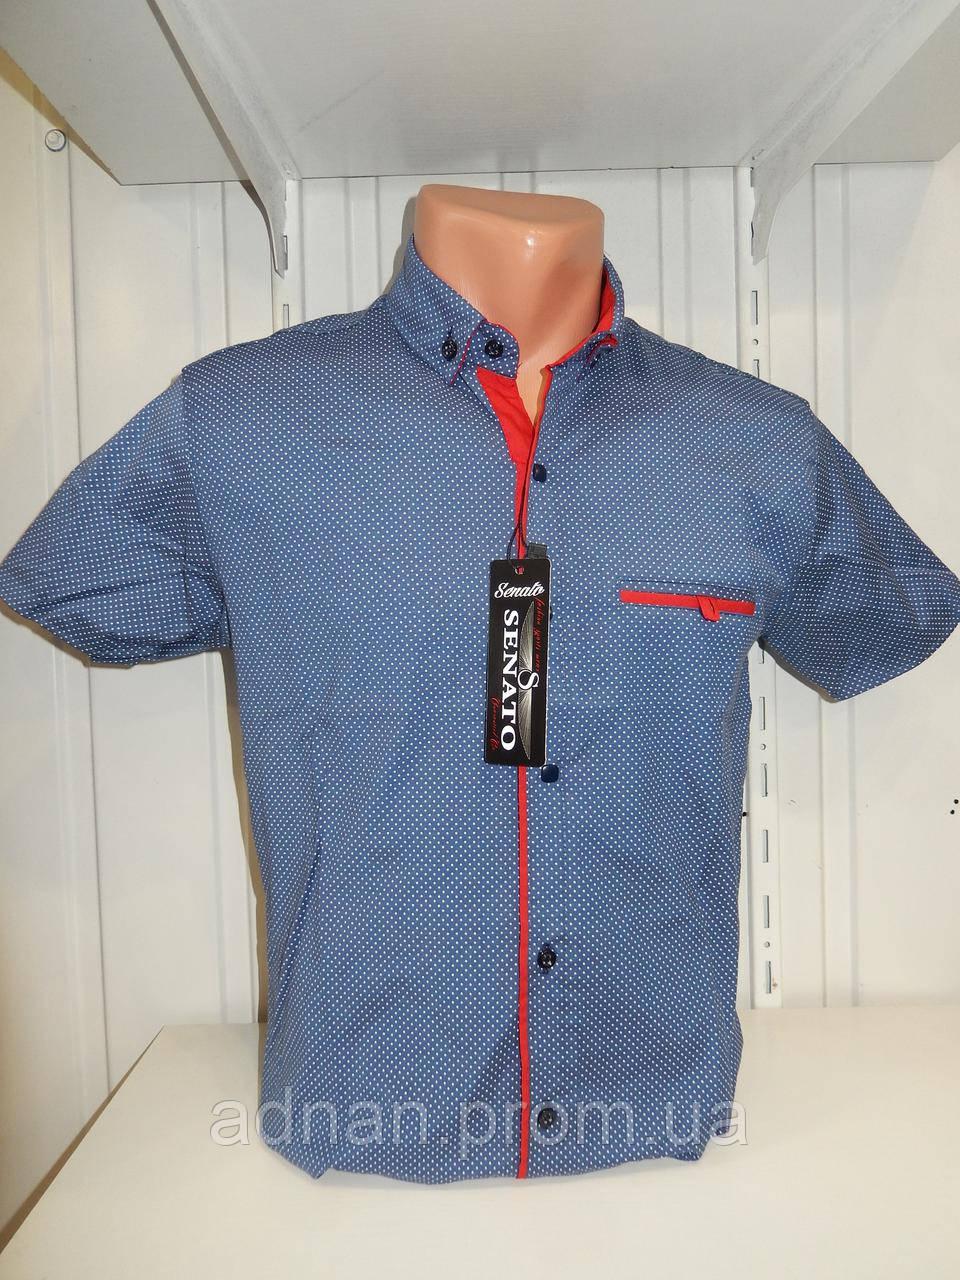 Рубашка мужская SENATO короткий рукав, узор, стрейч котон 18.06 002 \ купить рубашку оптом.